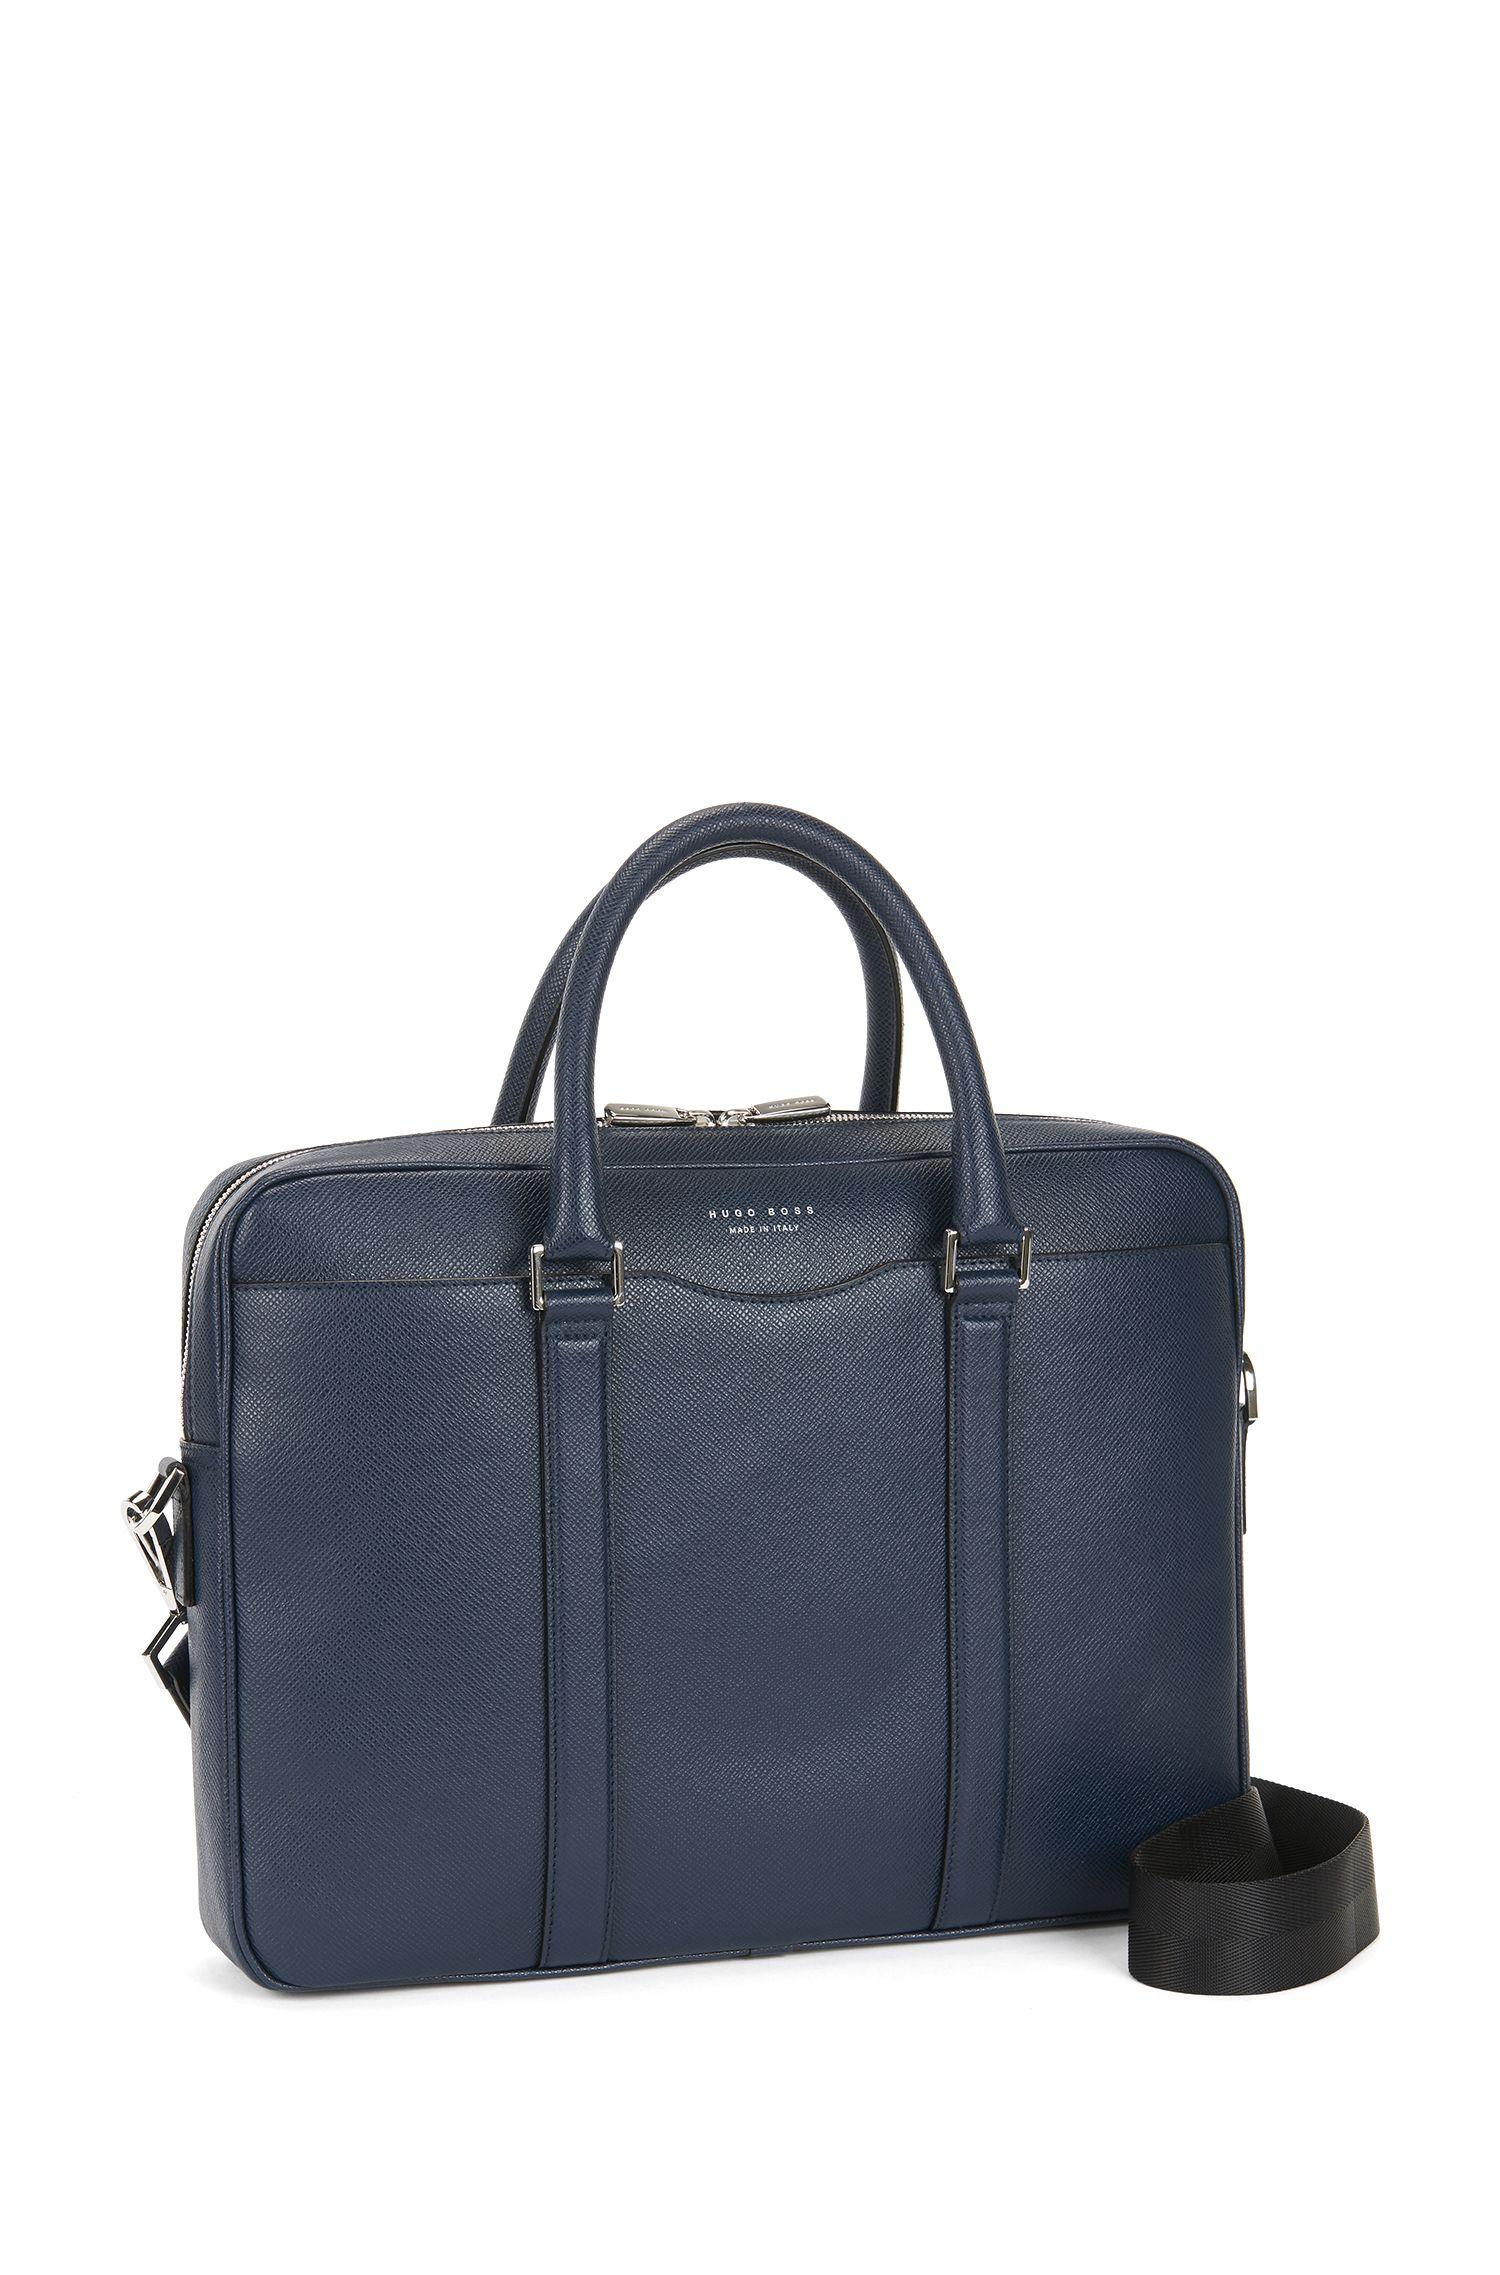 Italian Calfskin Workbag | Signature S Doc, Dark Blue